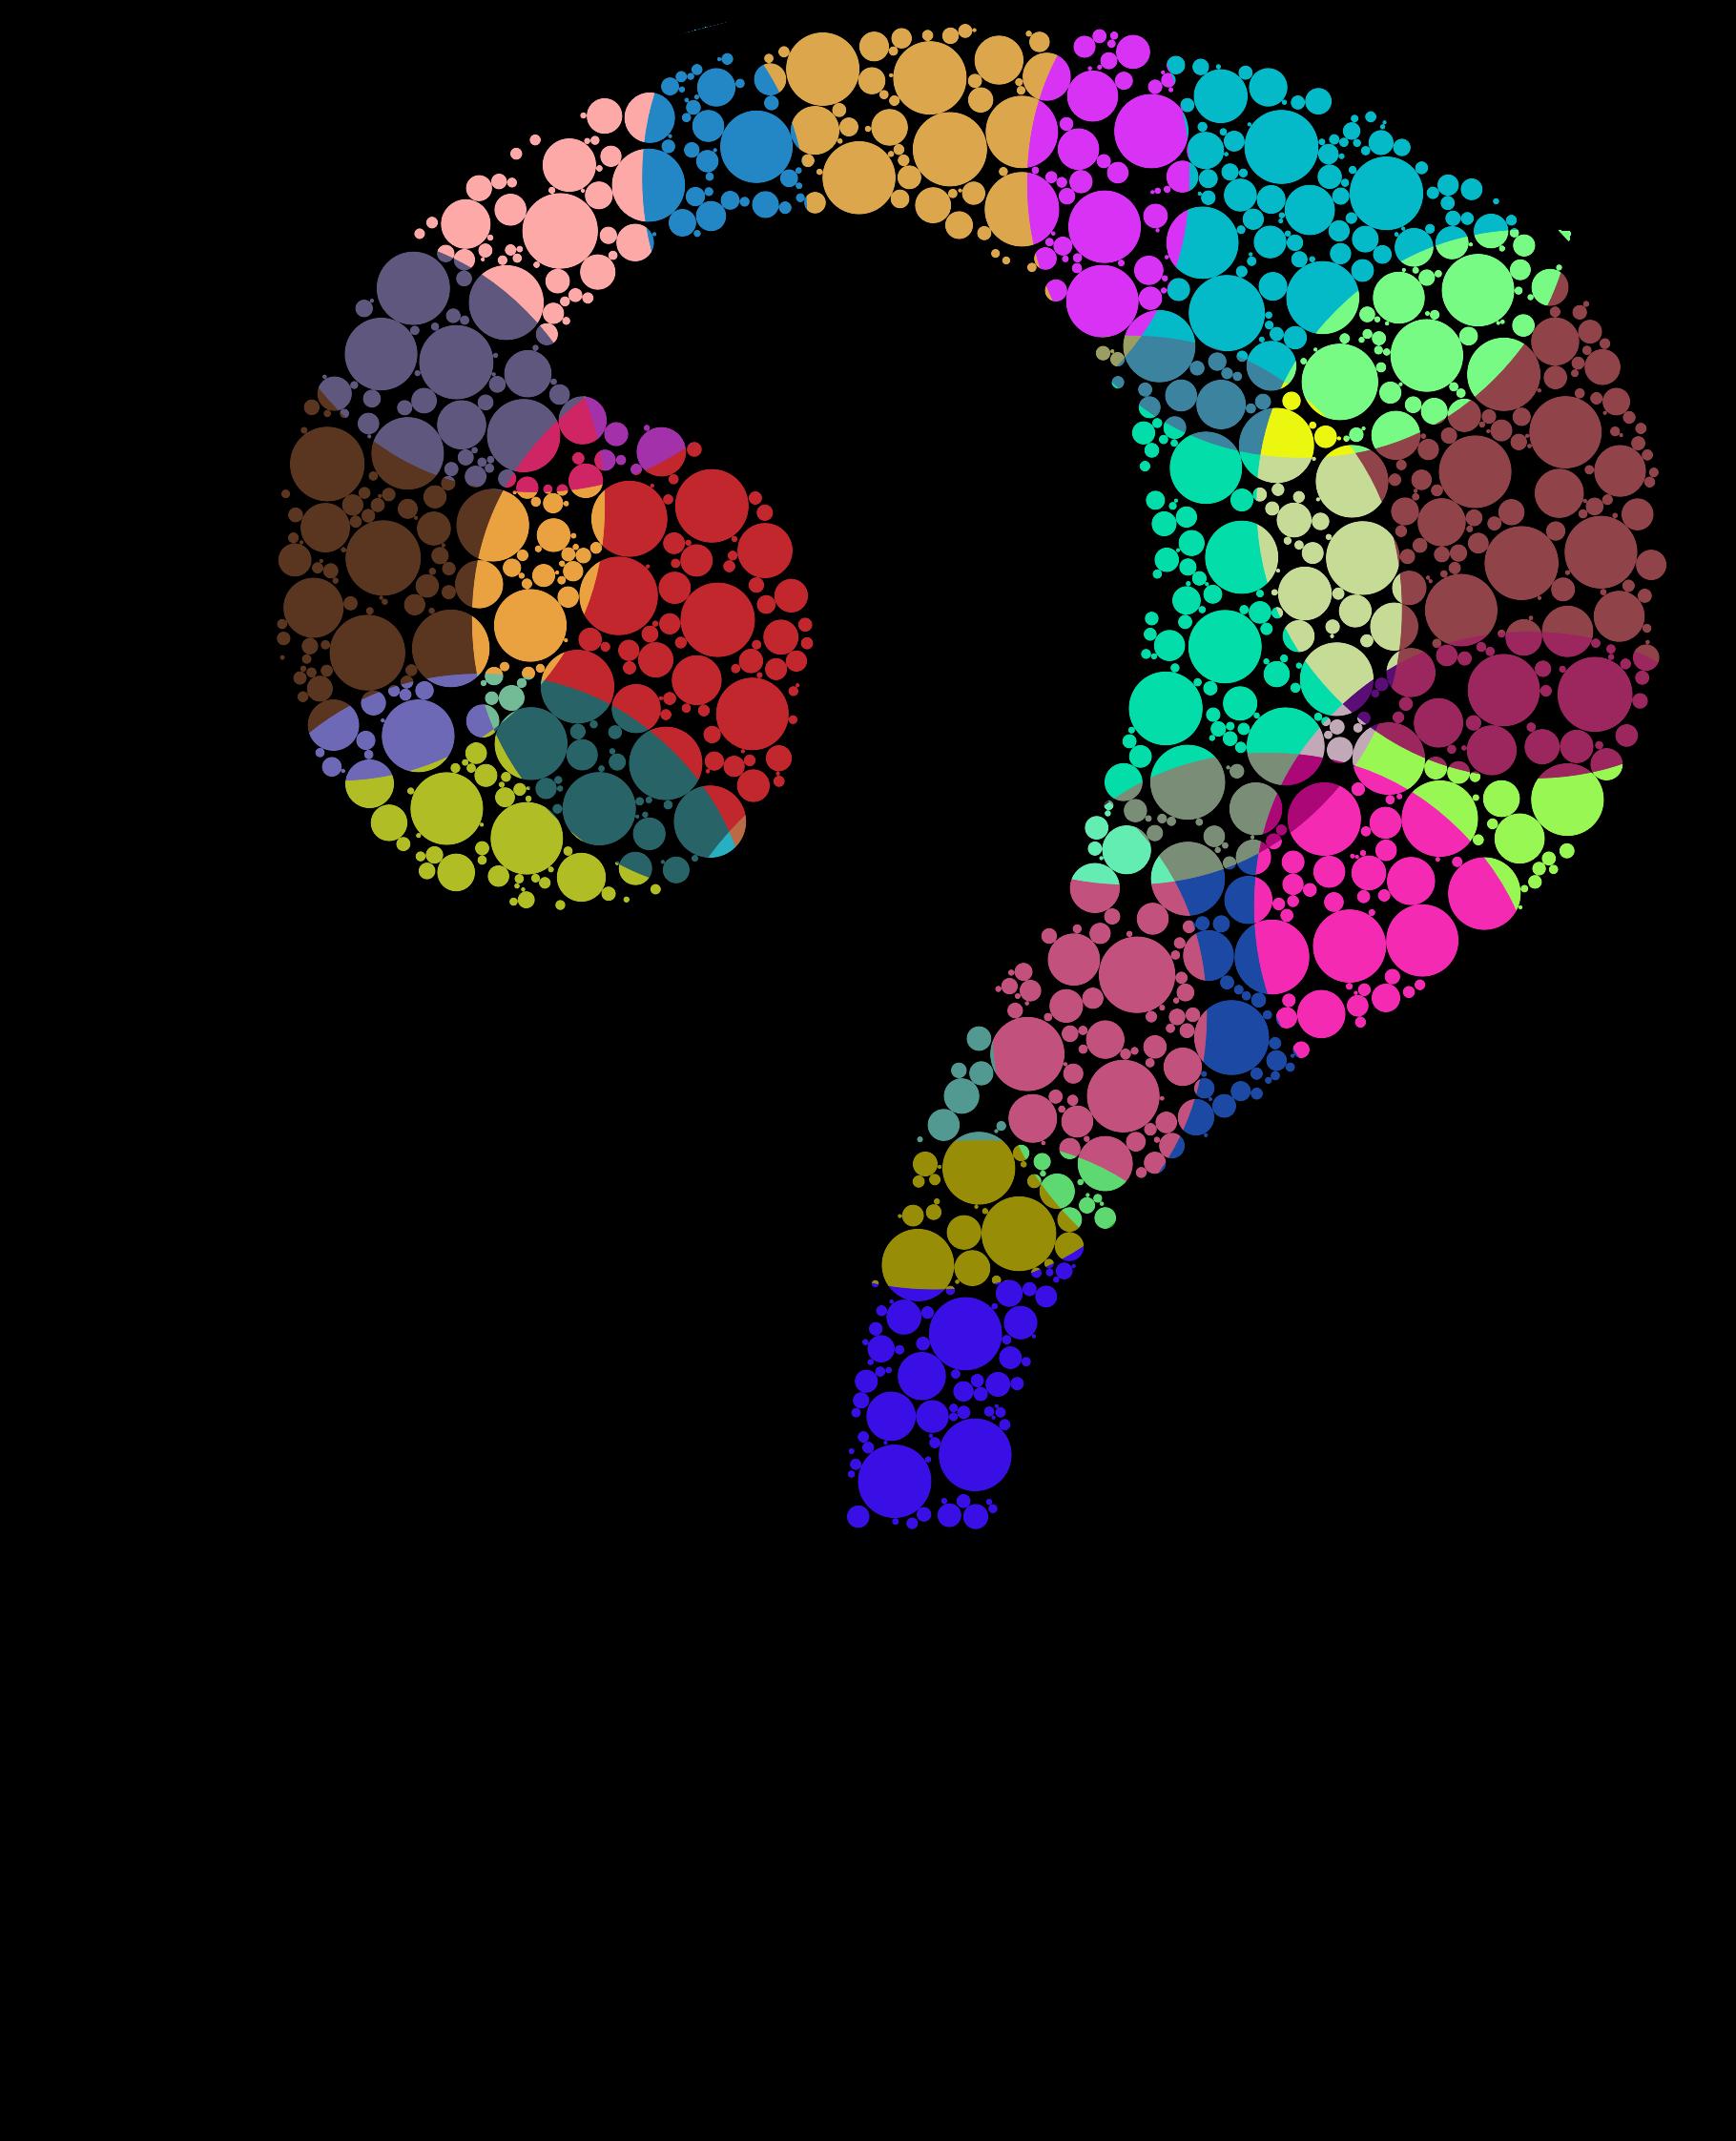 Head clipart question. Colorful circles big image